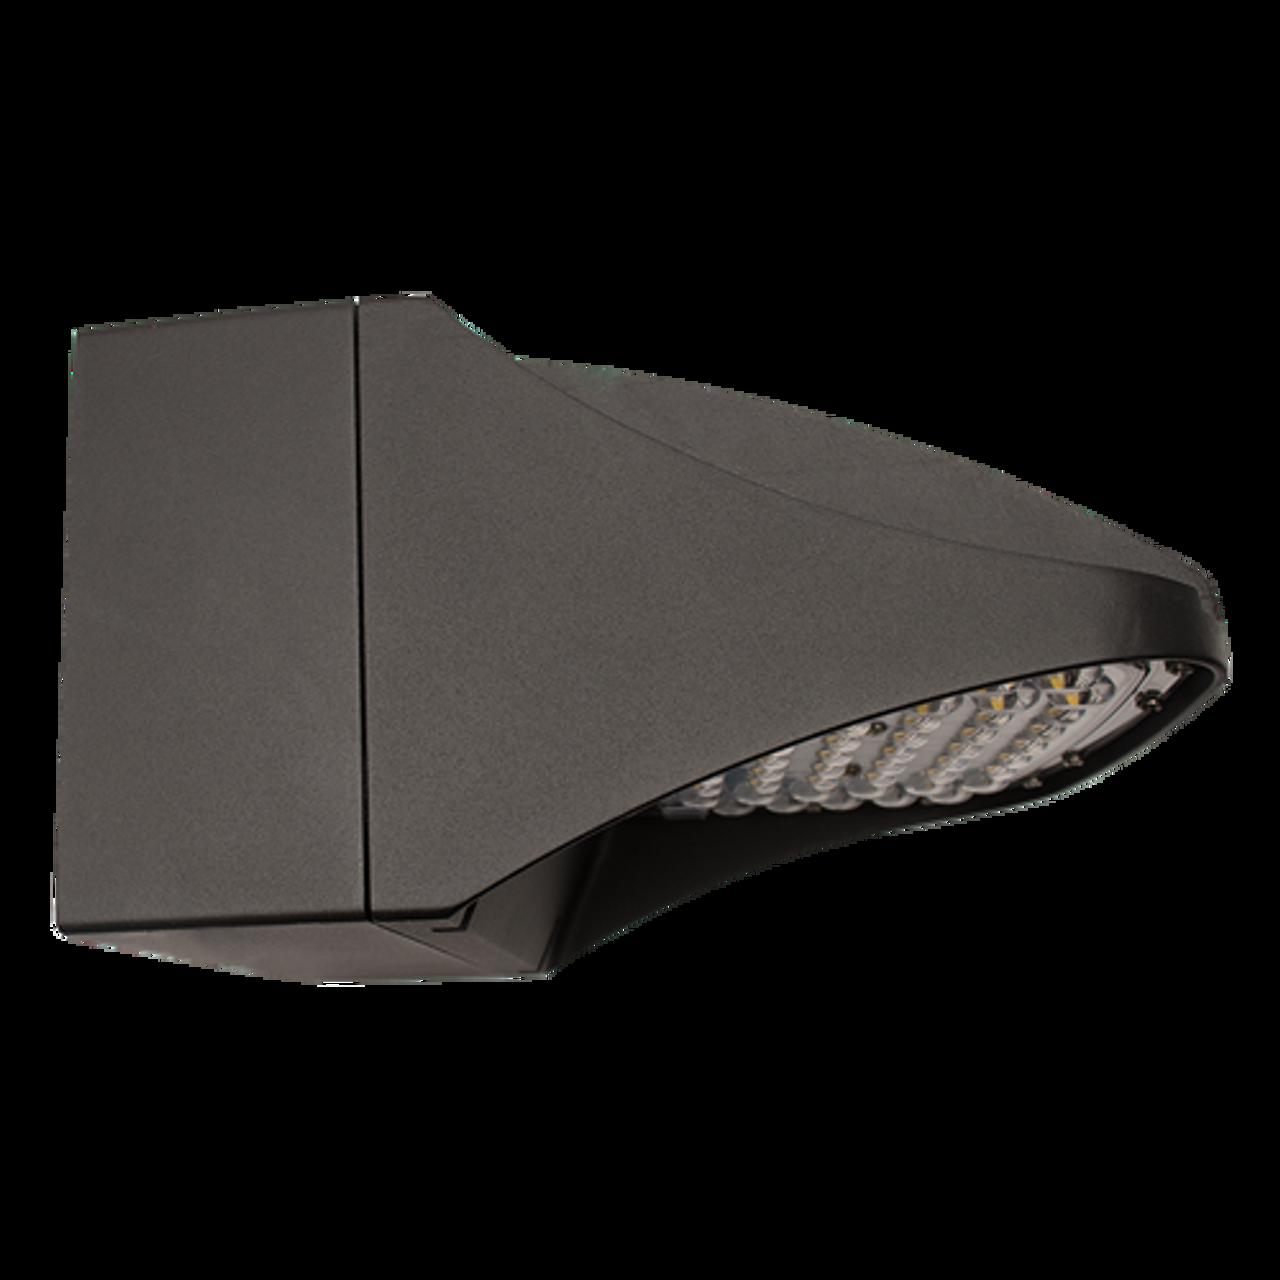 Full Cutoff Wallpack 25 Watt PowerPack with Battery Back-up